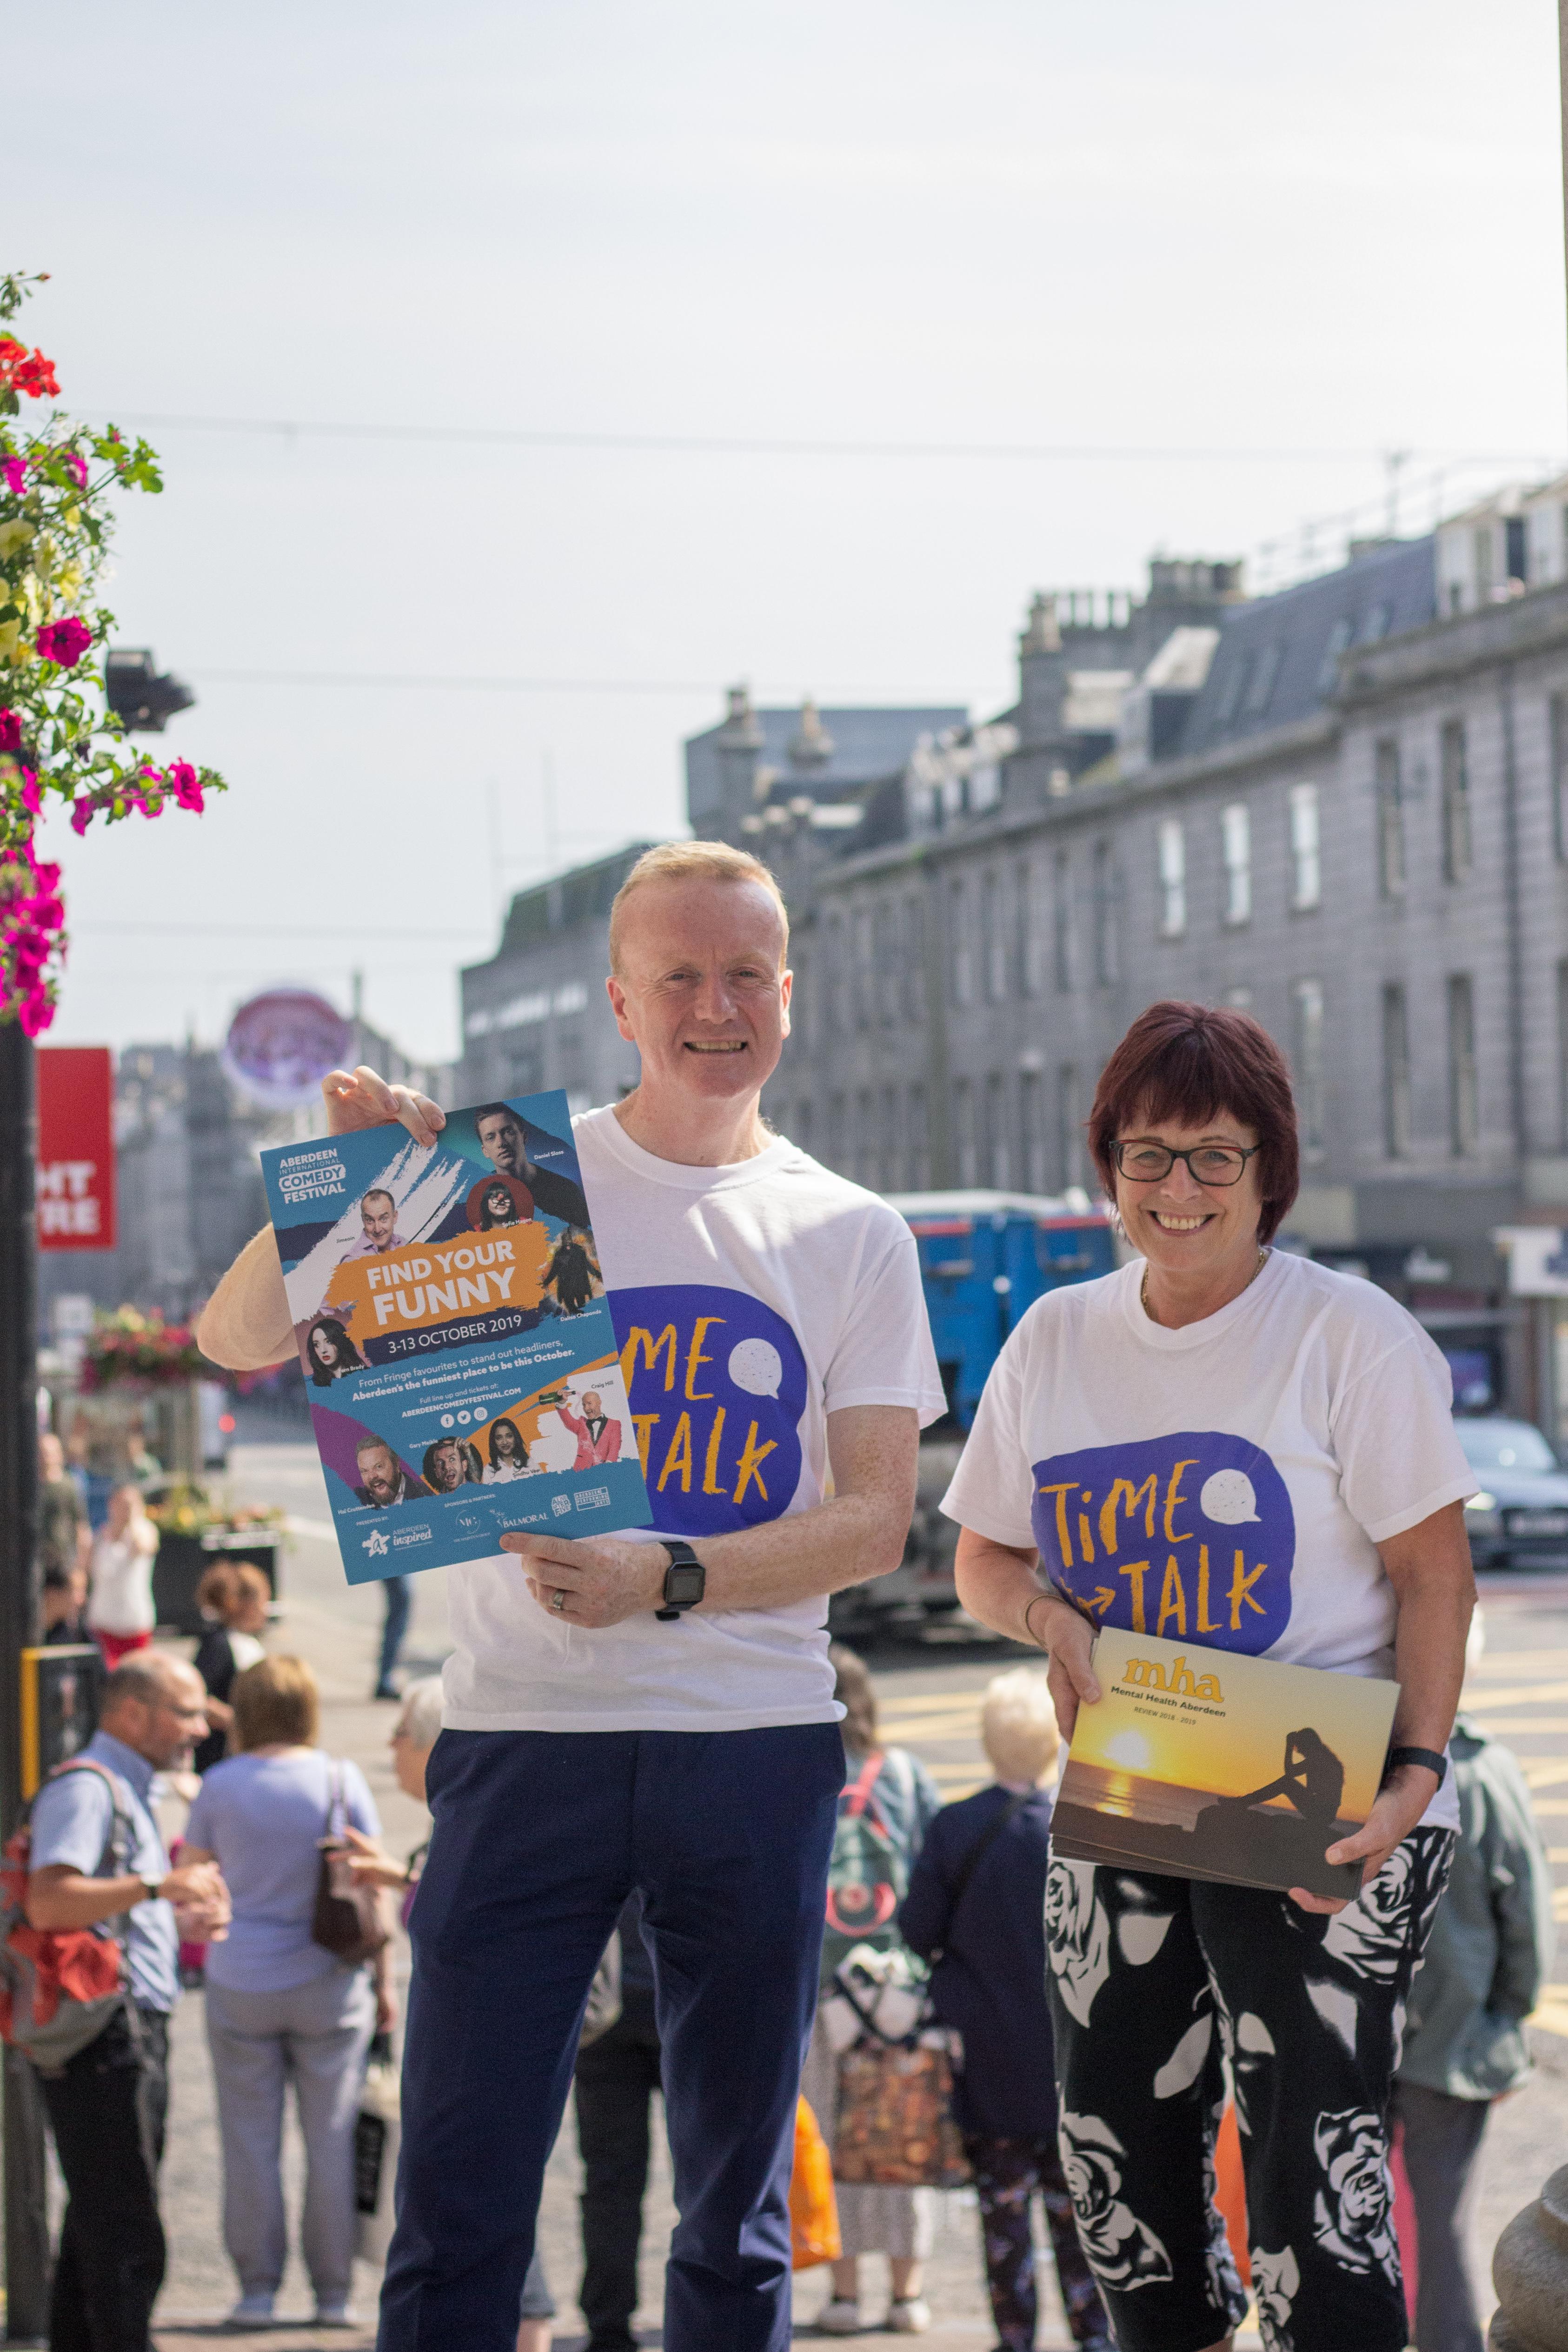 Aberdeen International Comedy Festival teams up with Mental Health Aberdeen